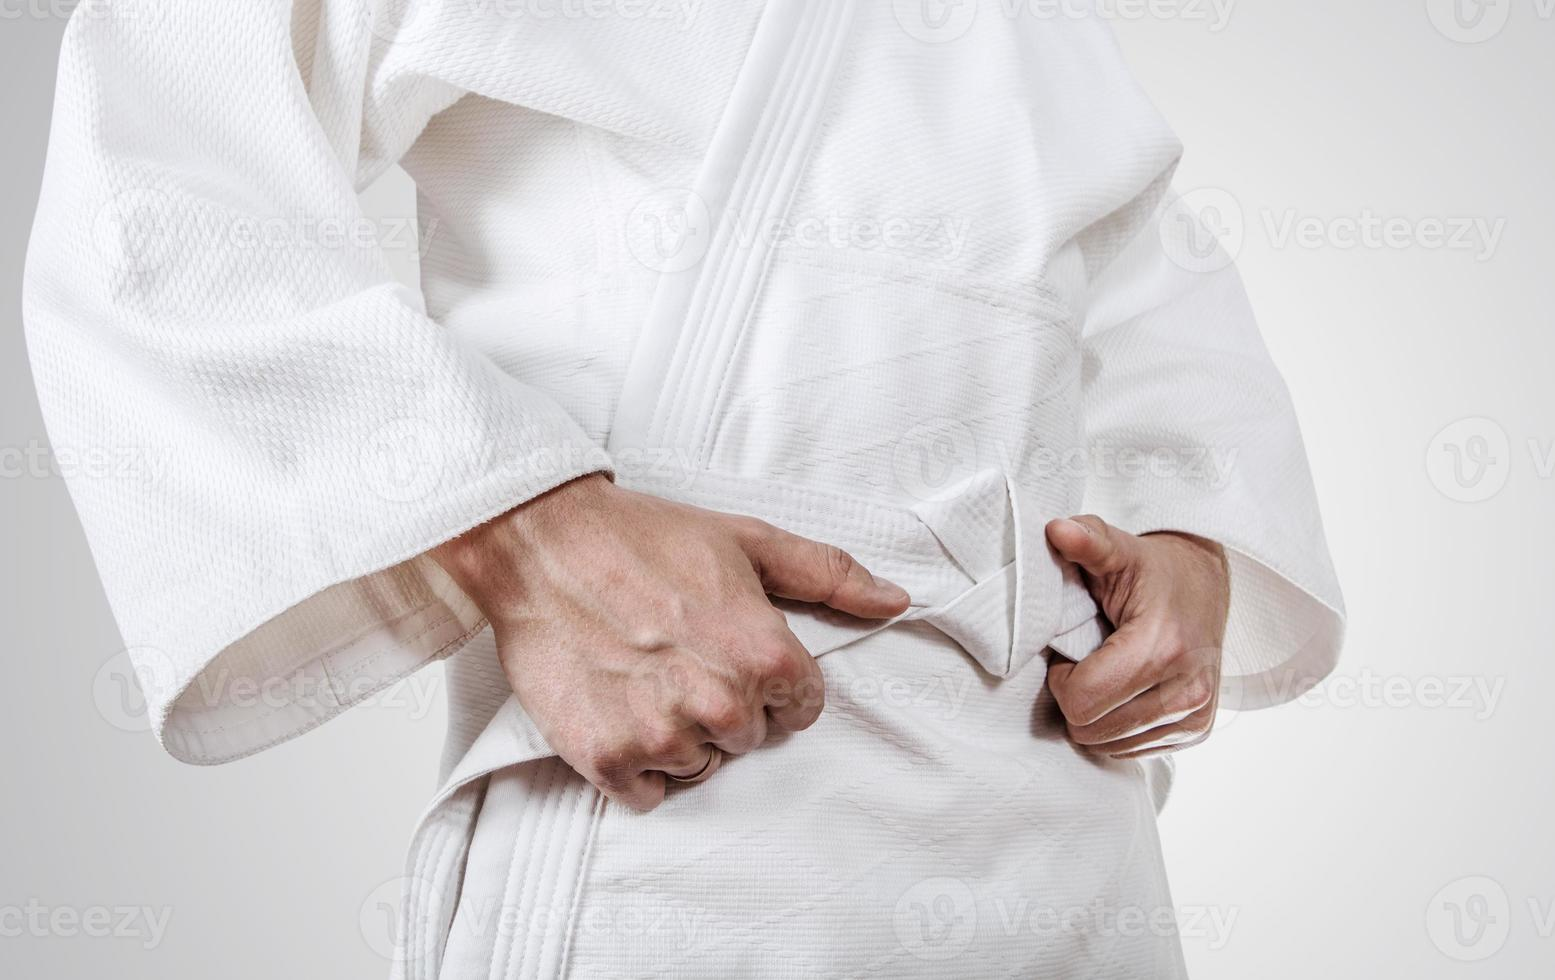 knyta upp kimonobältets närbild foto